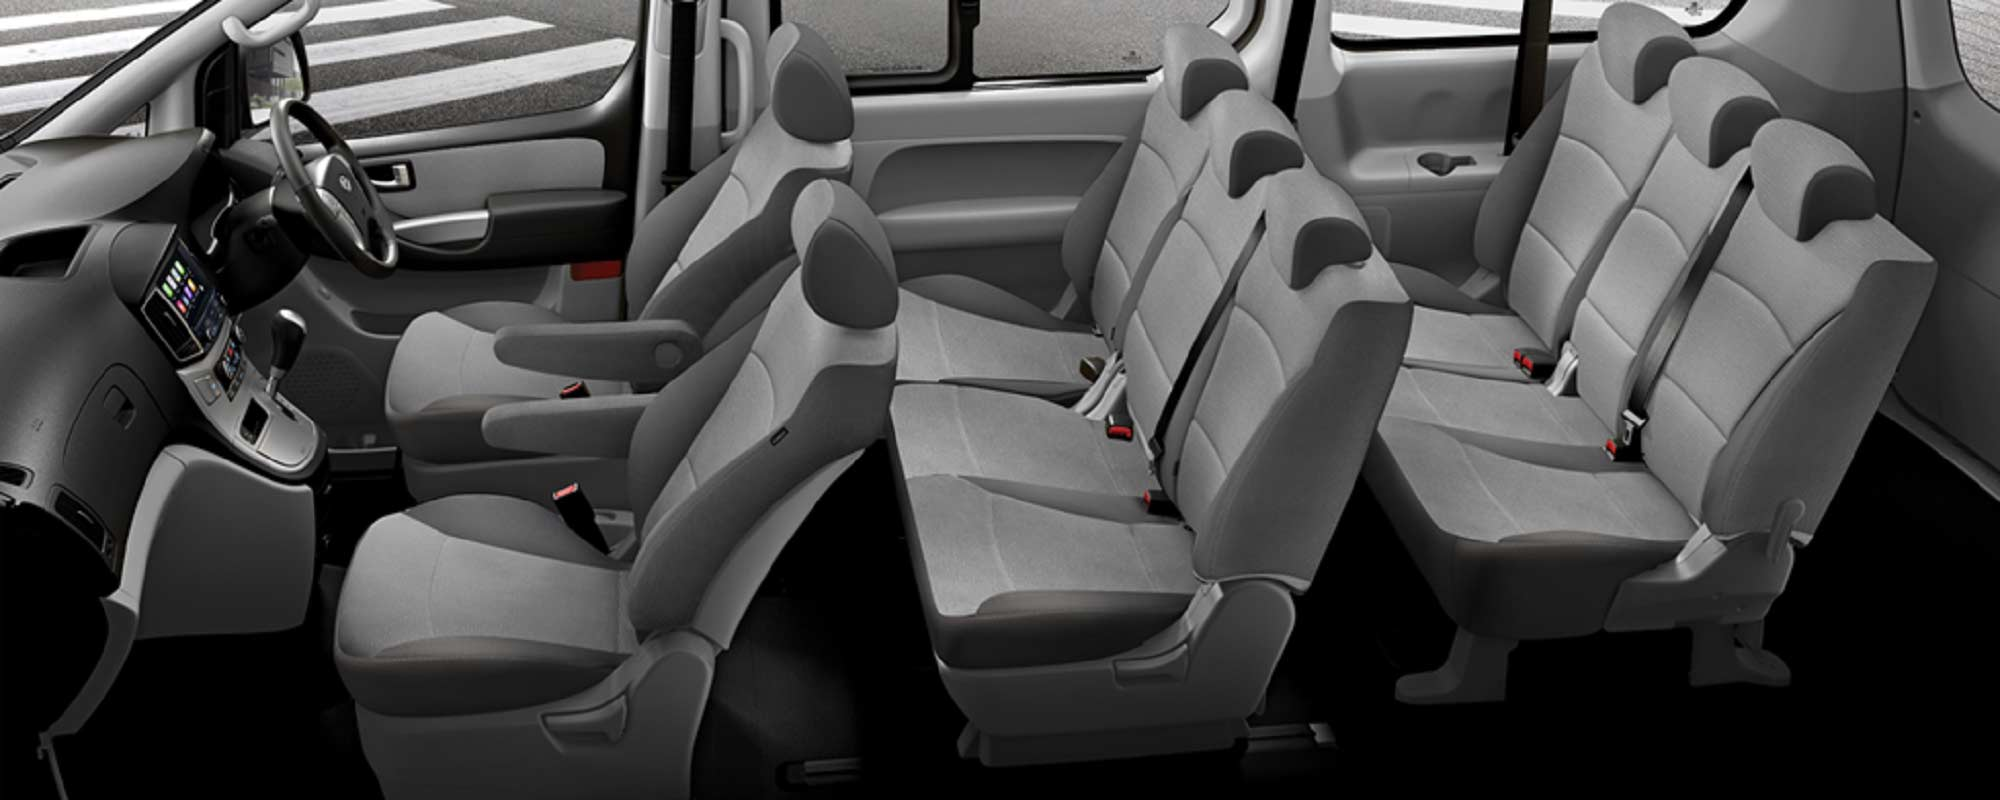 Hyundai Imax Car Seat Covers